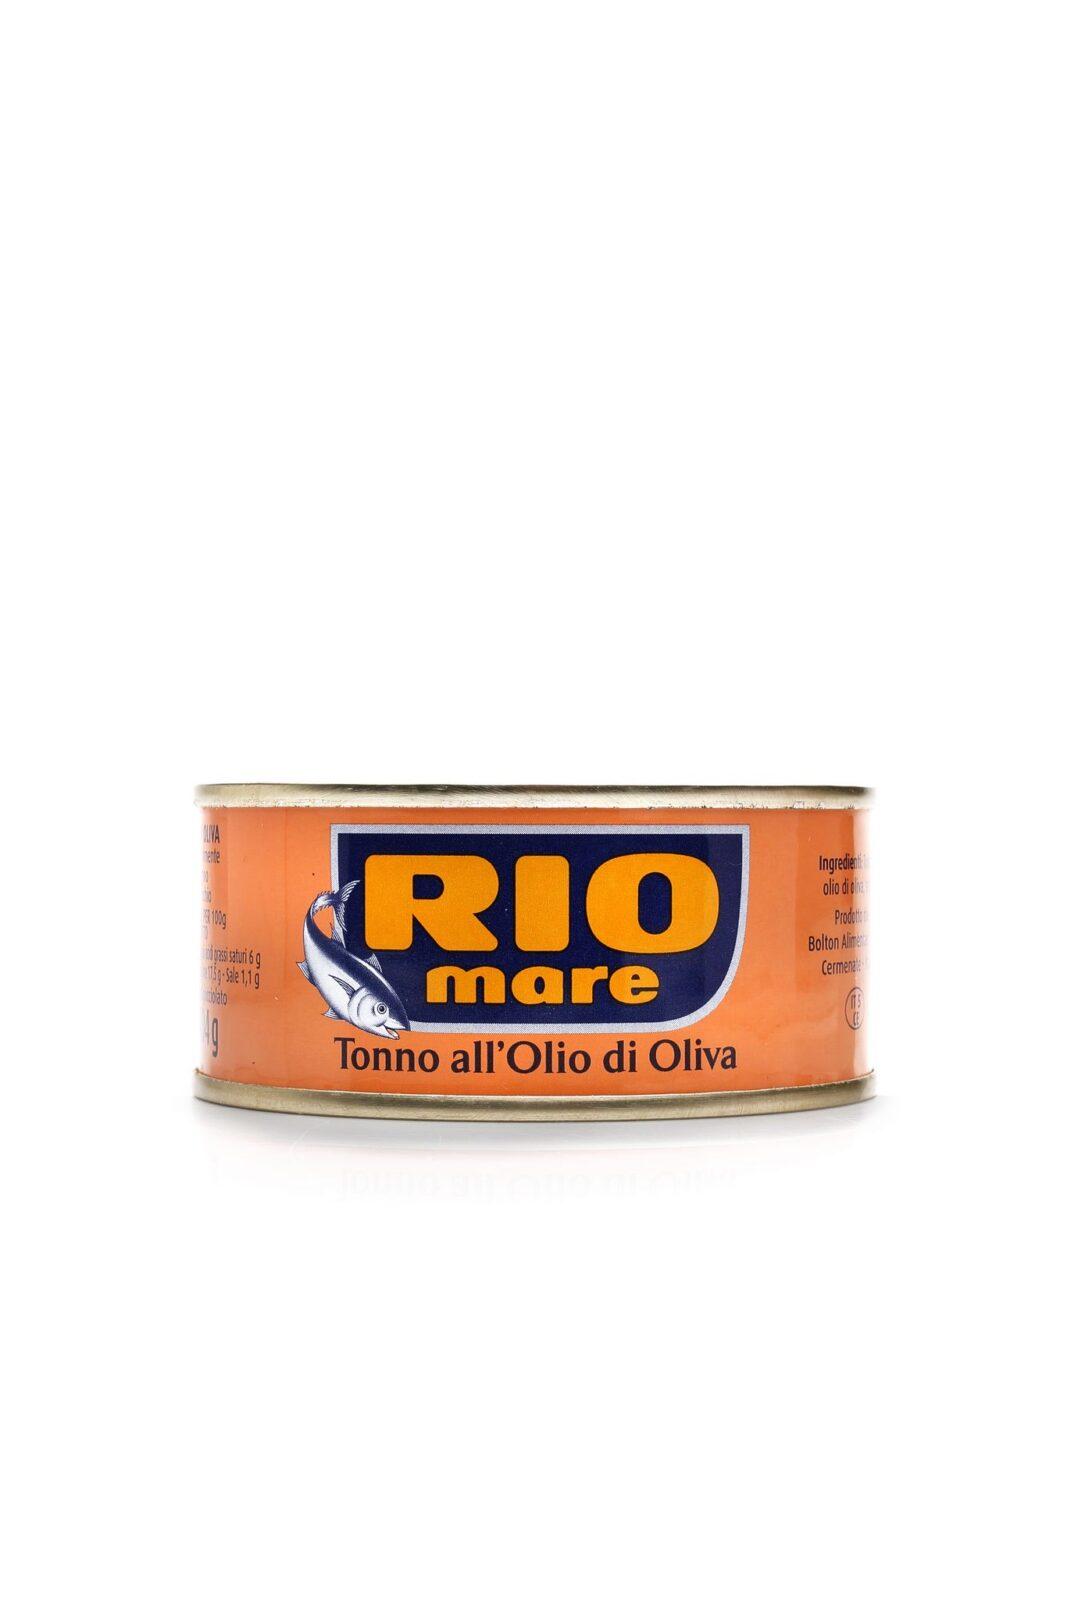 RIO MARE TUŃCZYK